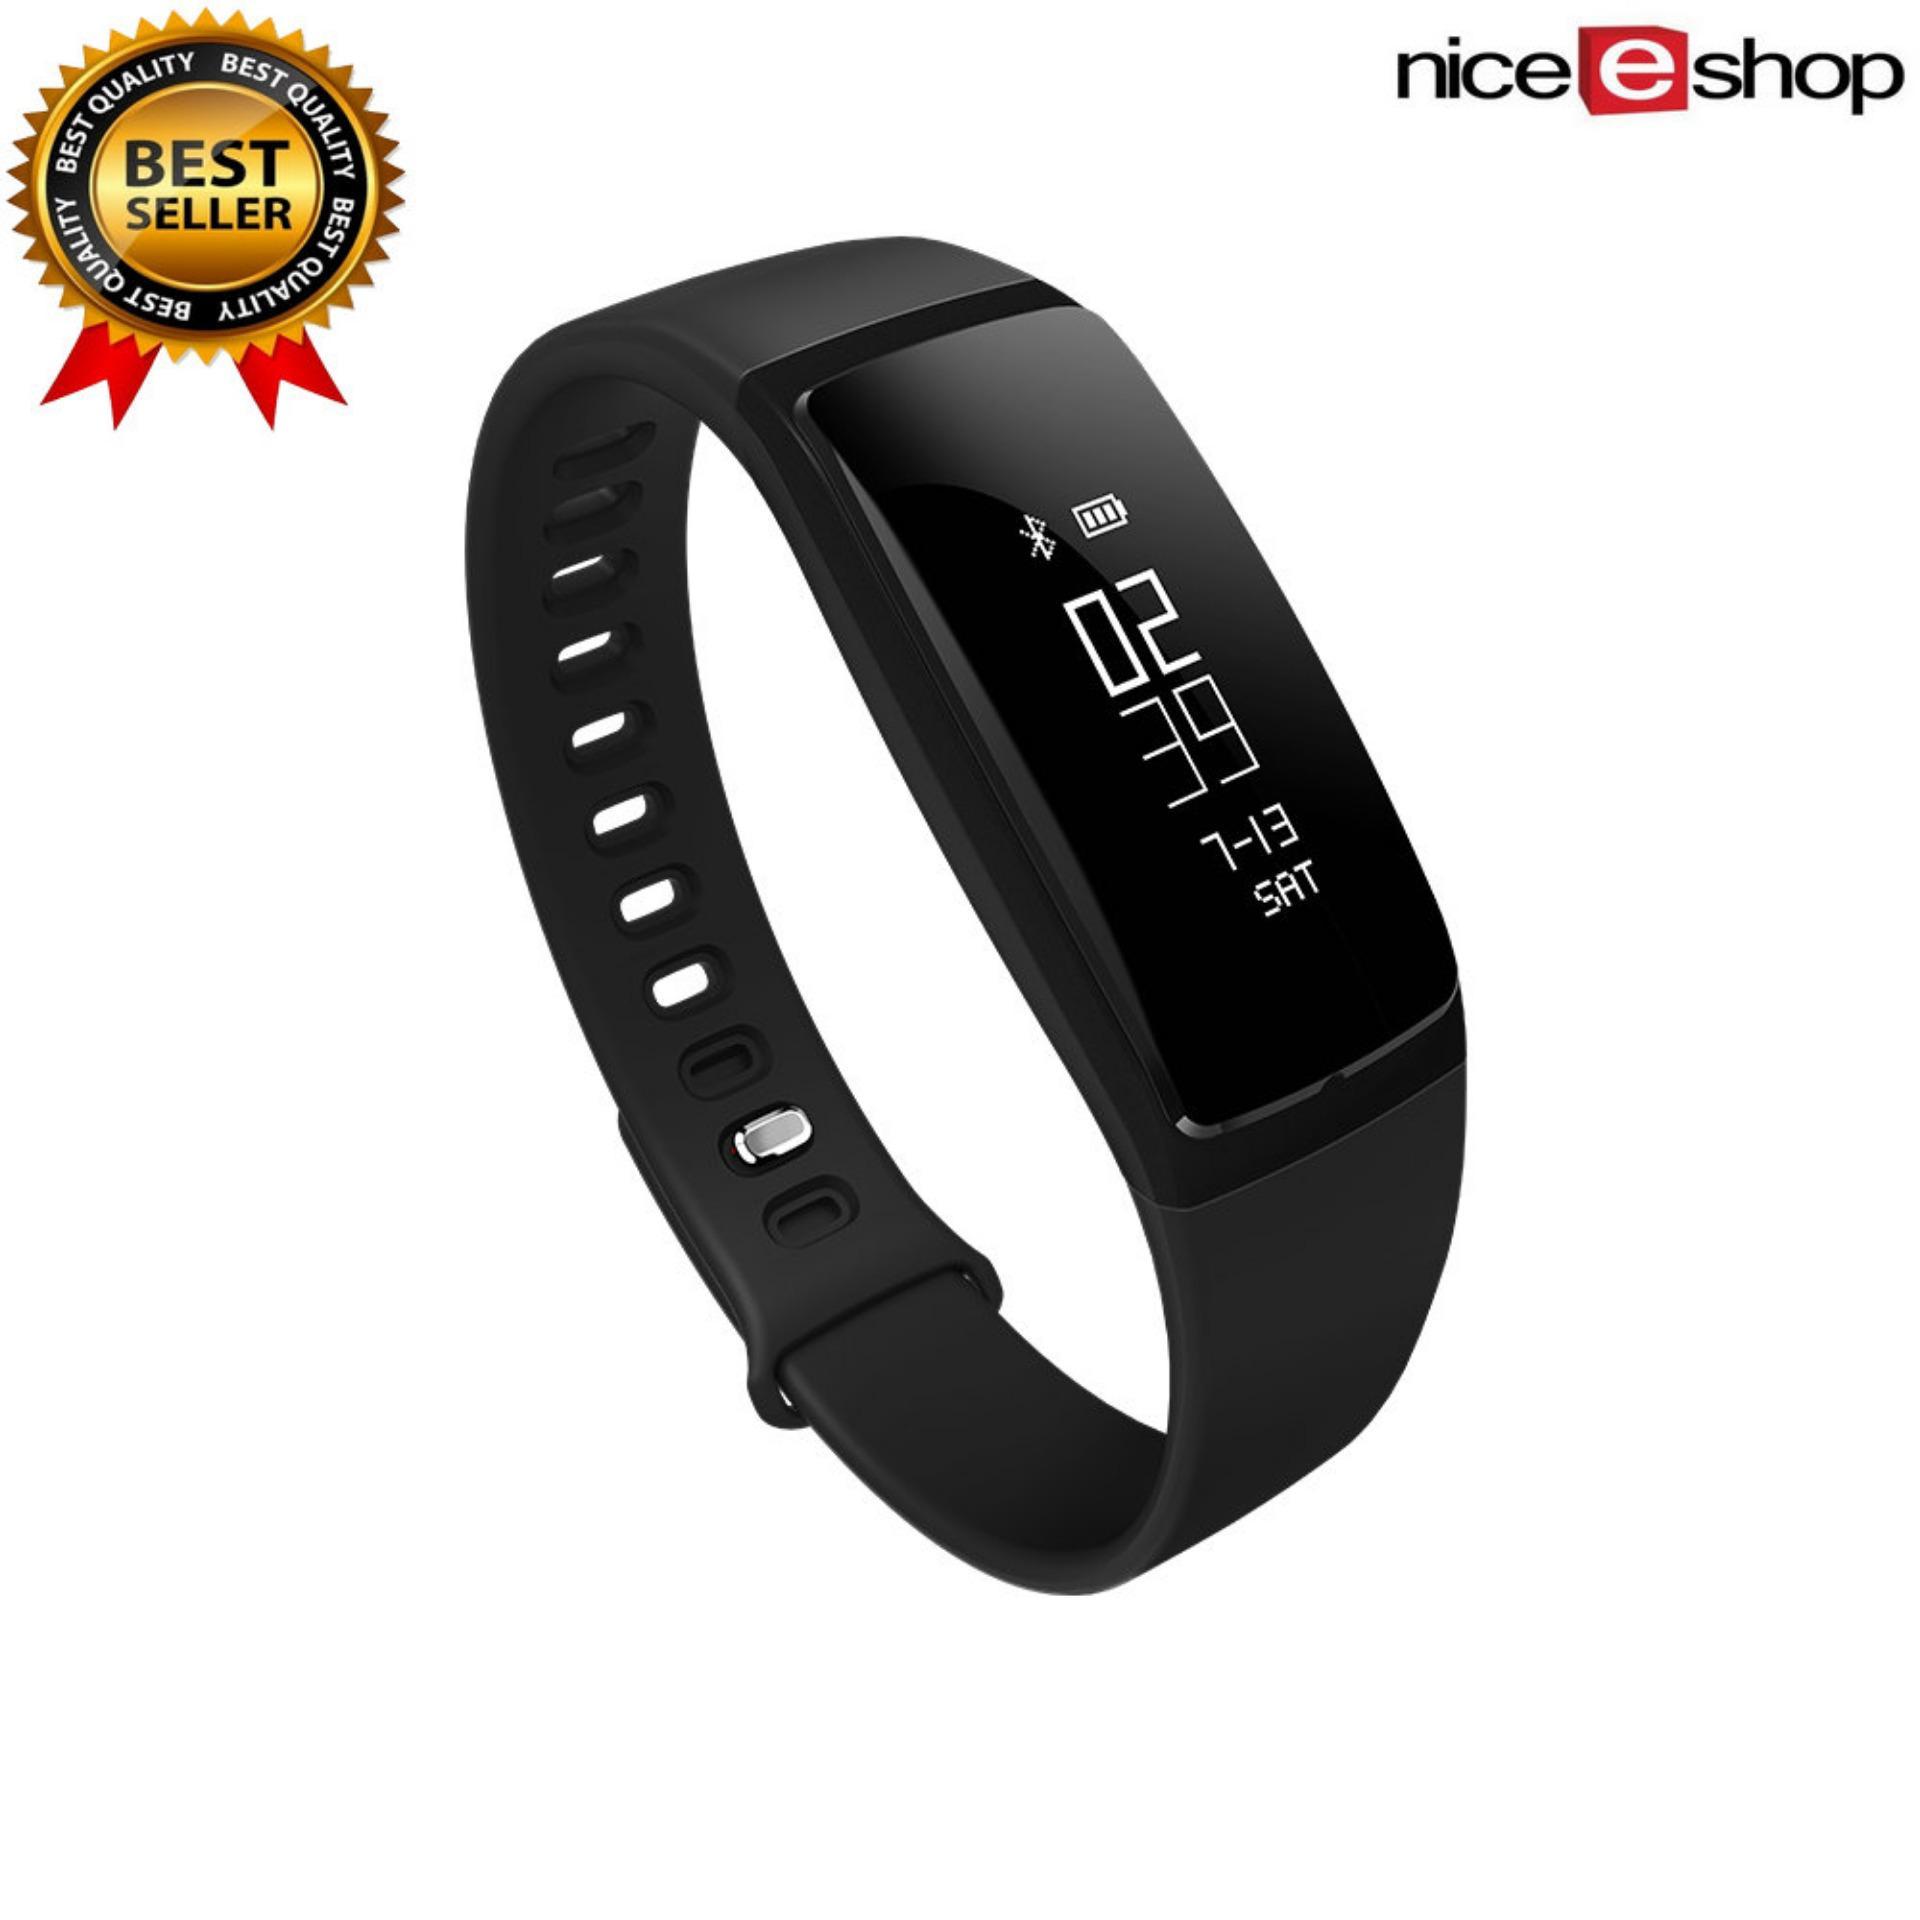 ... niceEshop Smart Band jam tekanan darah V07 gelang pintar menonton Monitor denyut jantung SmartBand Wireless pusat ...